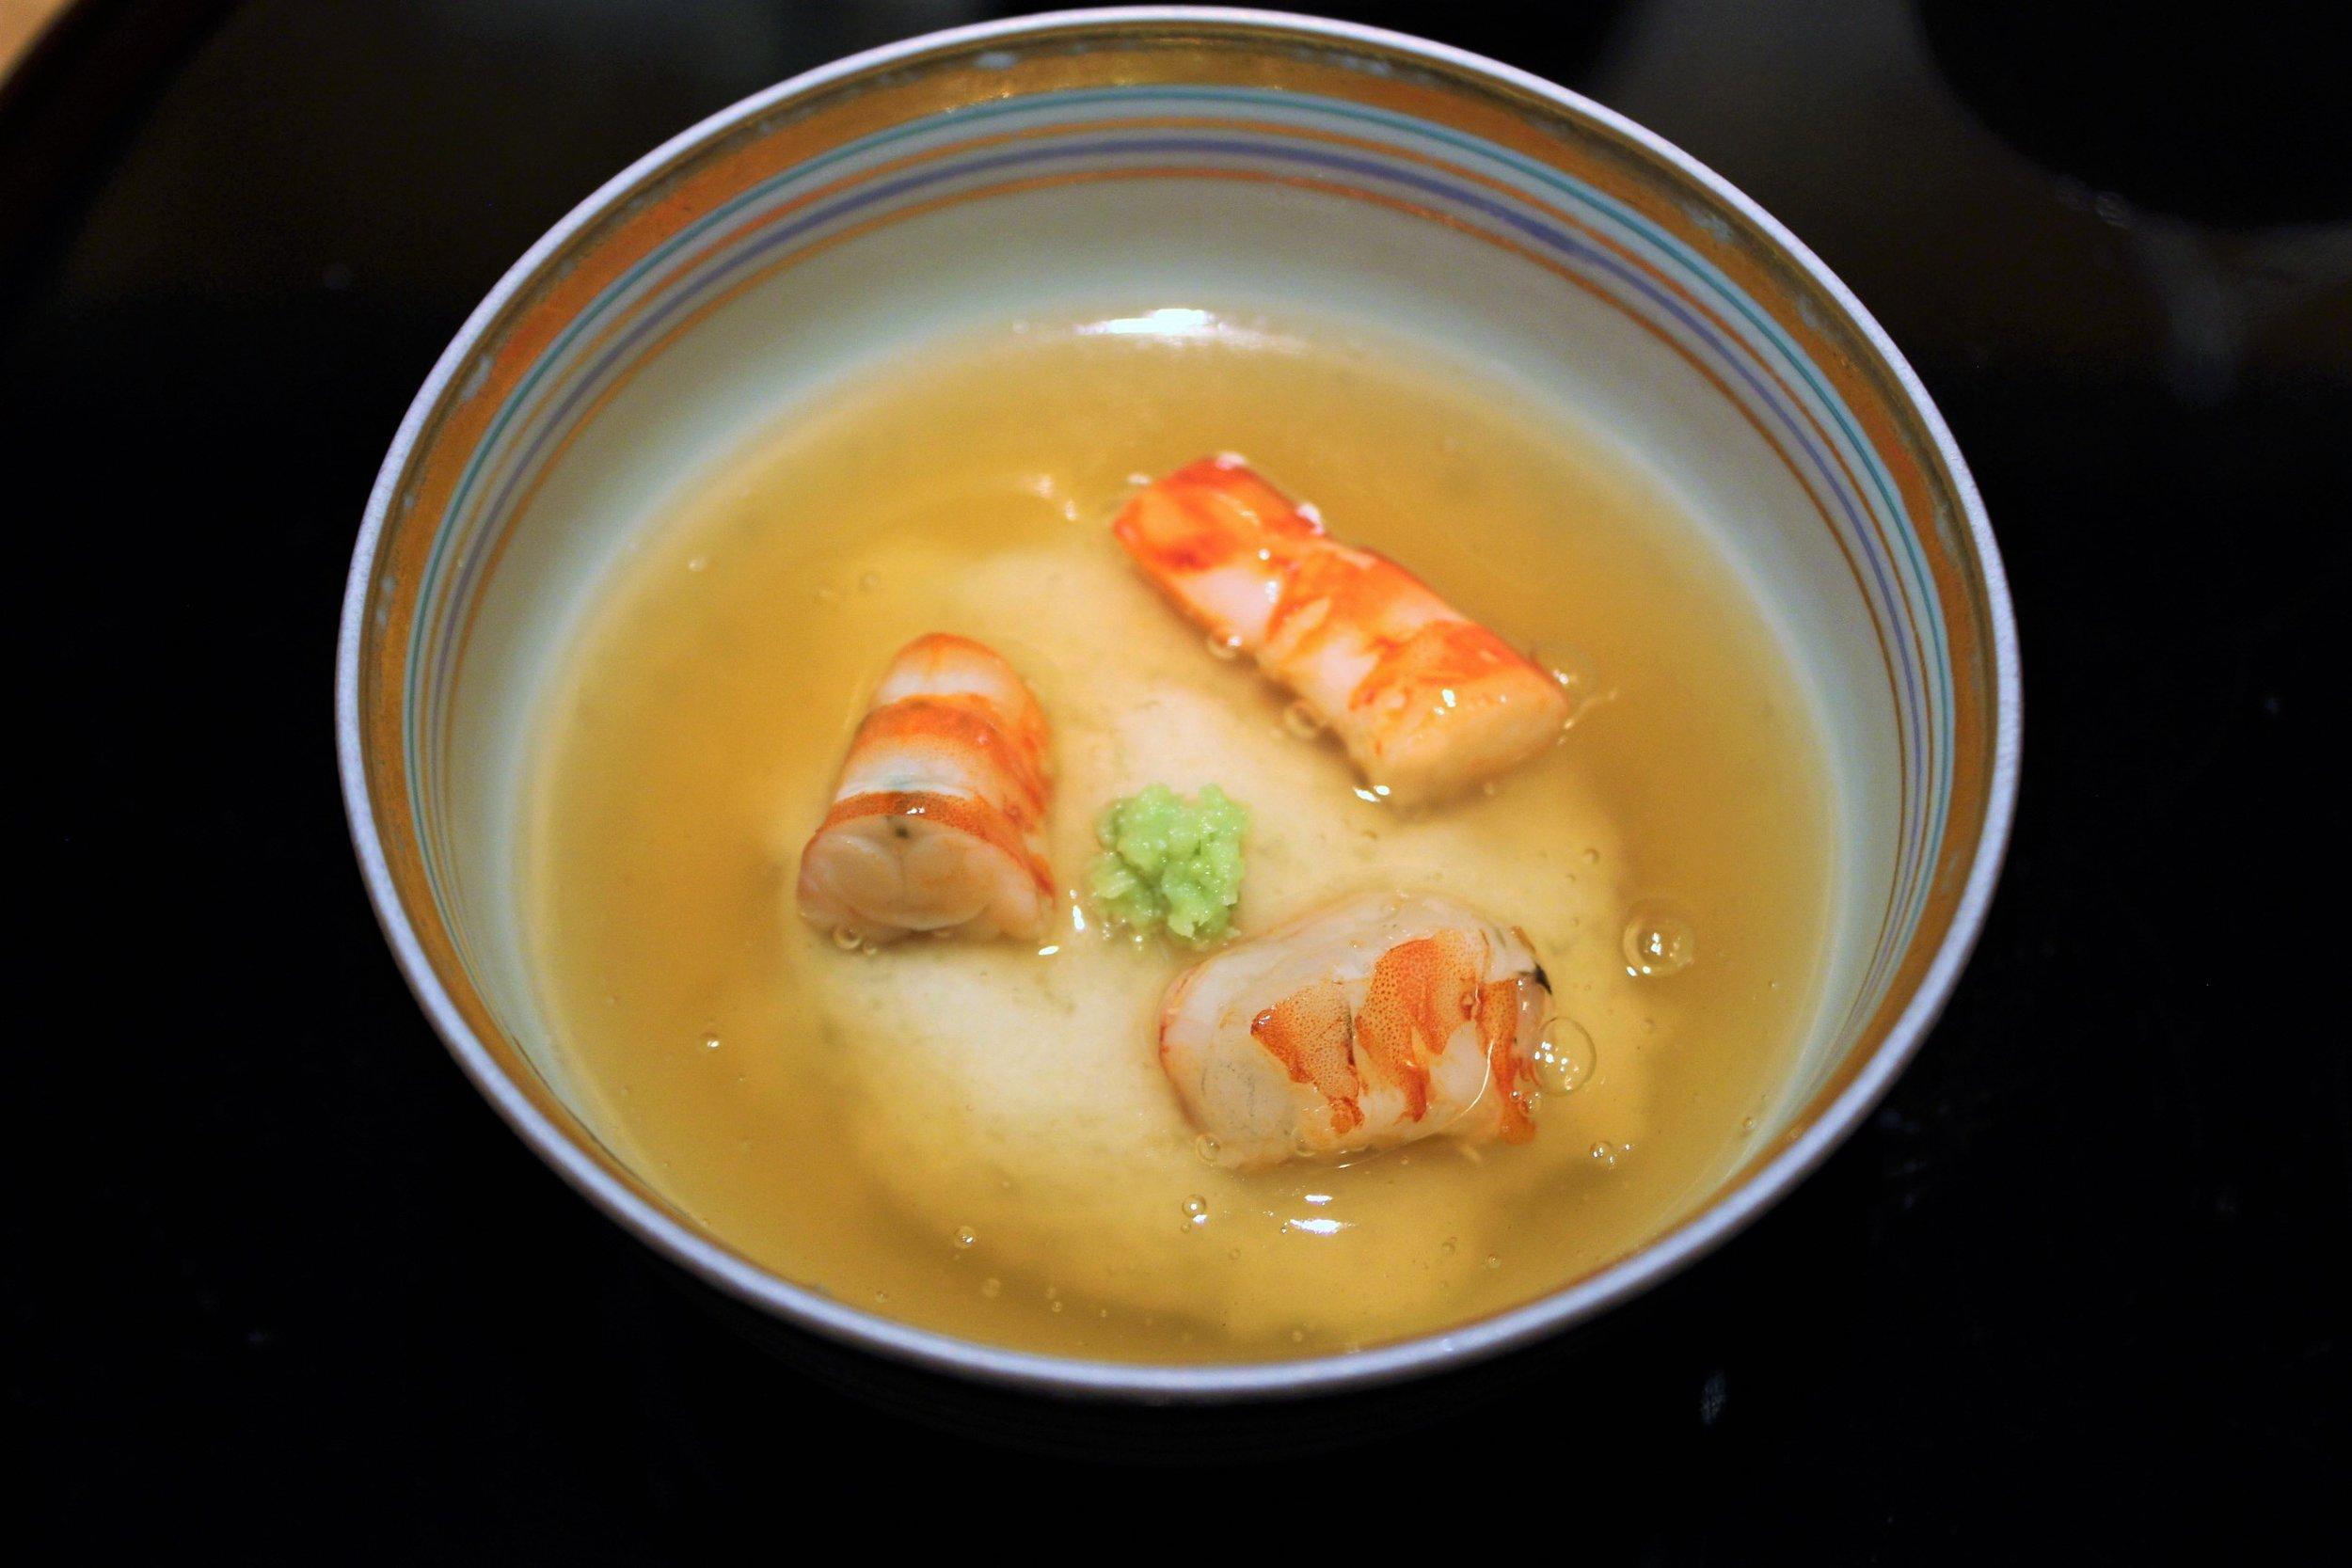 Shrimp, Turnip, Wasabi, and Gingko in Warm Dashi Jelly at Kien in Tokyo, Japan